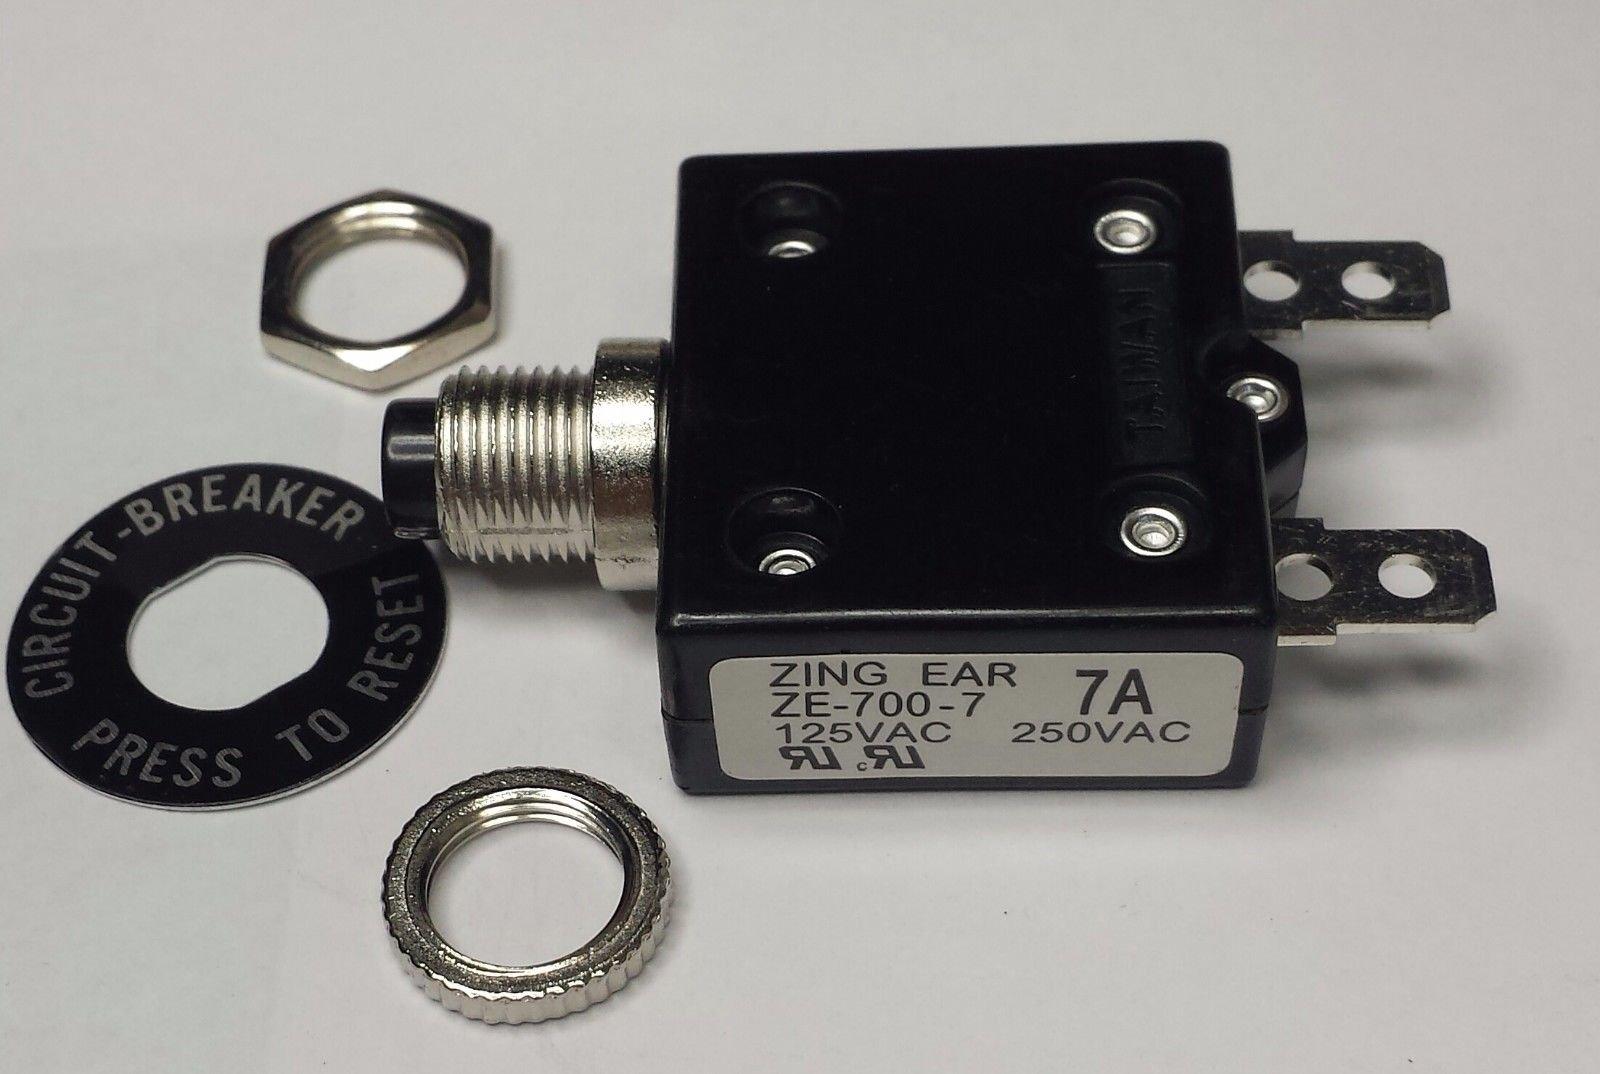 CBK Supply - ZE700-7A Zing Ear thermal circuit breaker replaces Carling, Joemex, Kuoyeh, P&B